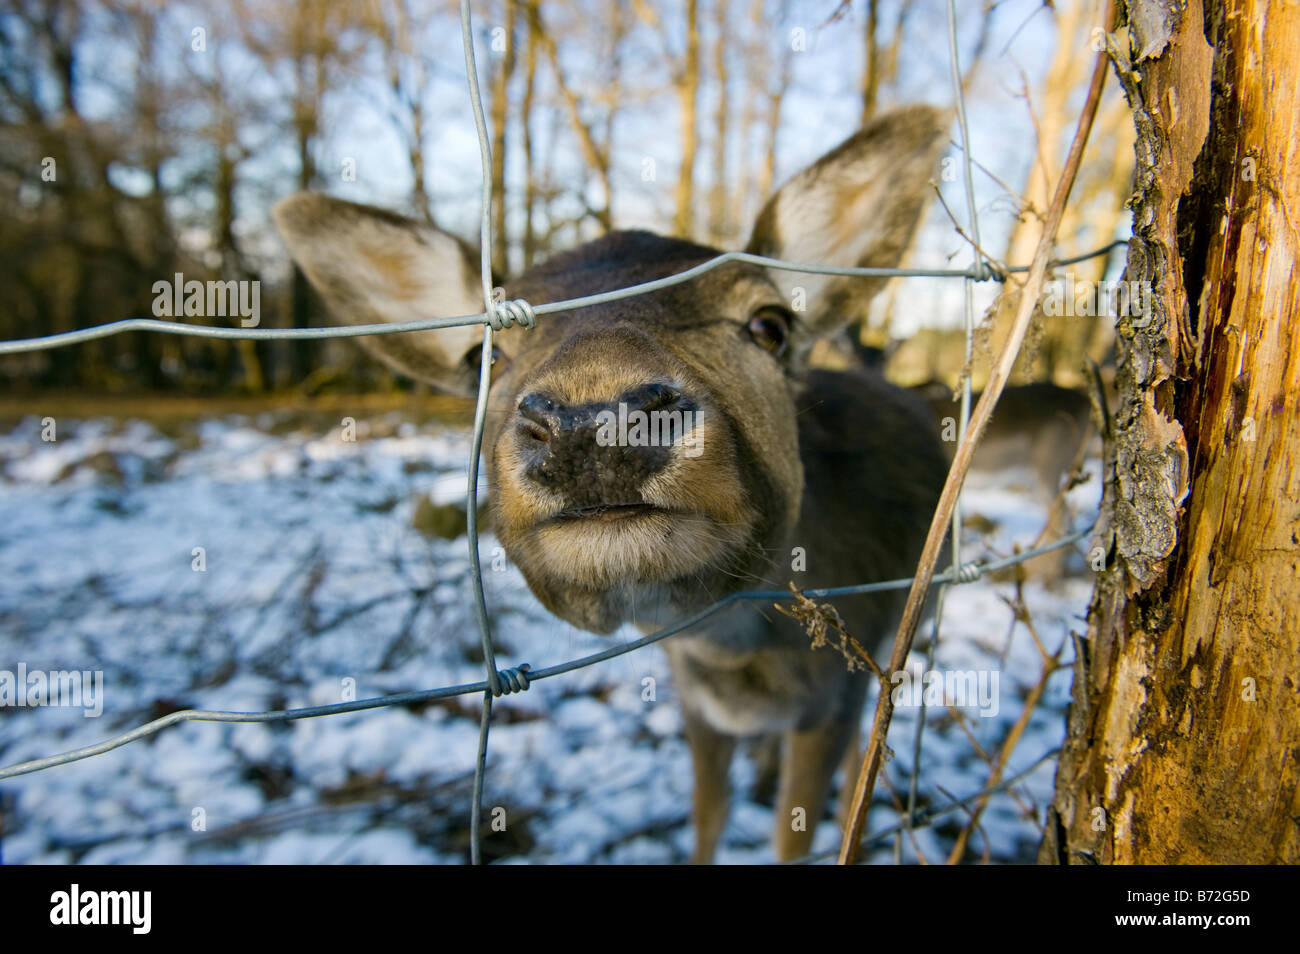 fallow deer DAMA DAMA venison roe deer winter wintertime snow cold face nose eye red deer cervus nippon  elaphus - Stock Image